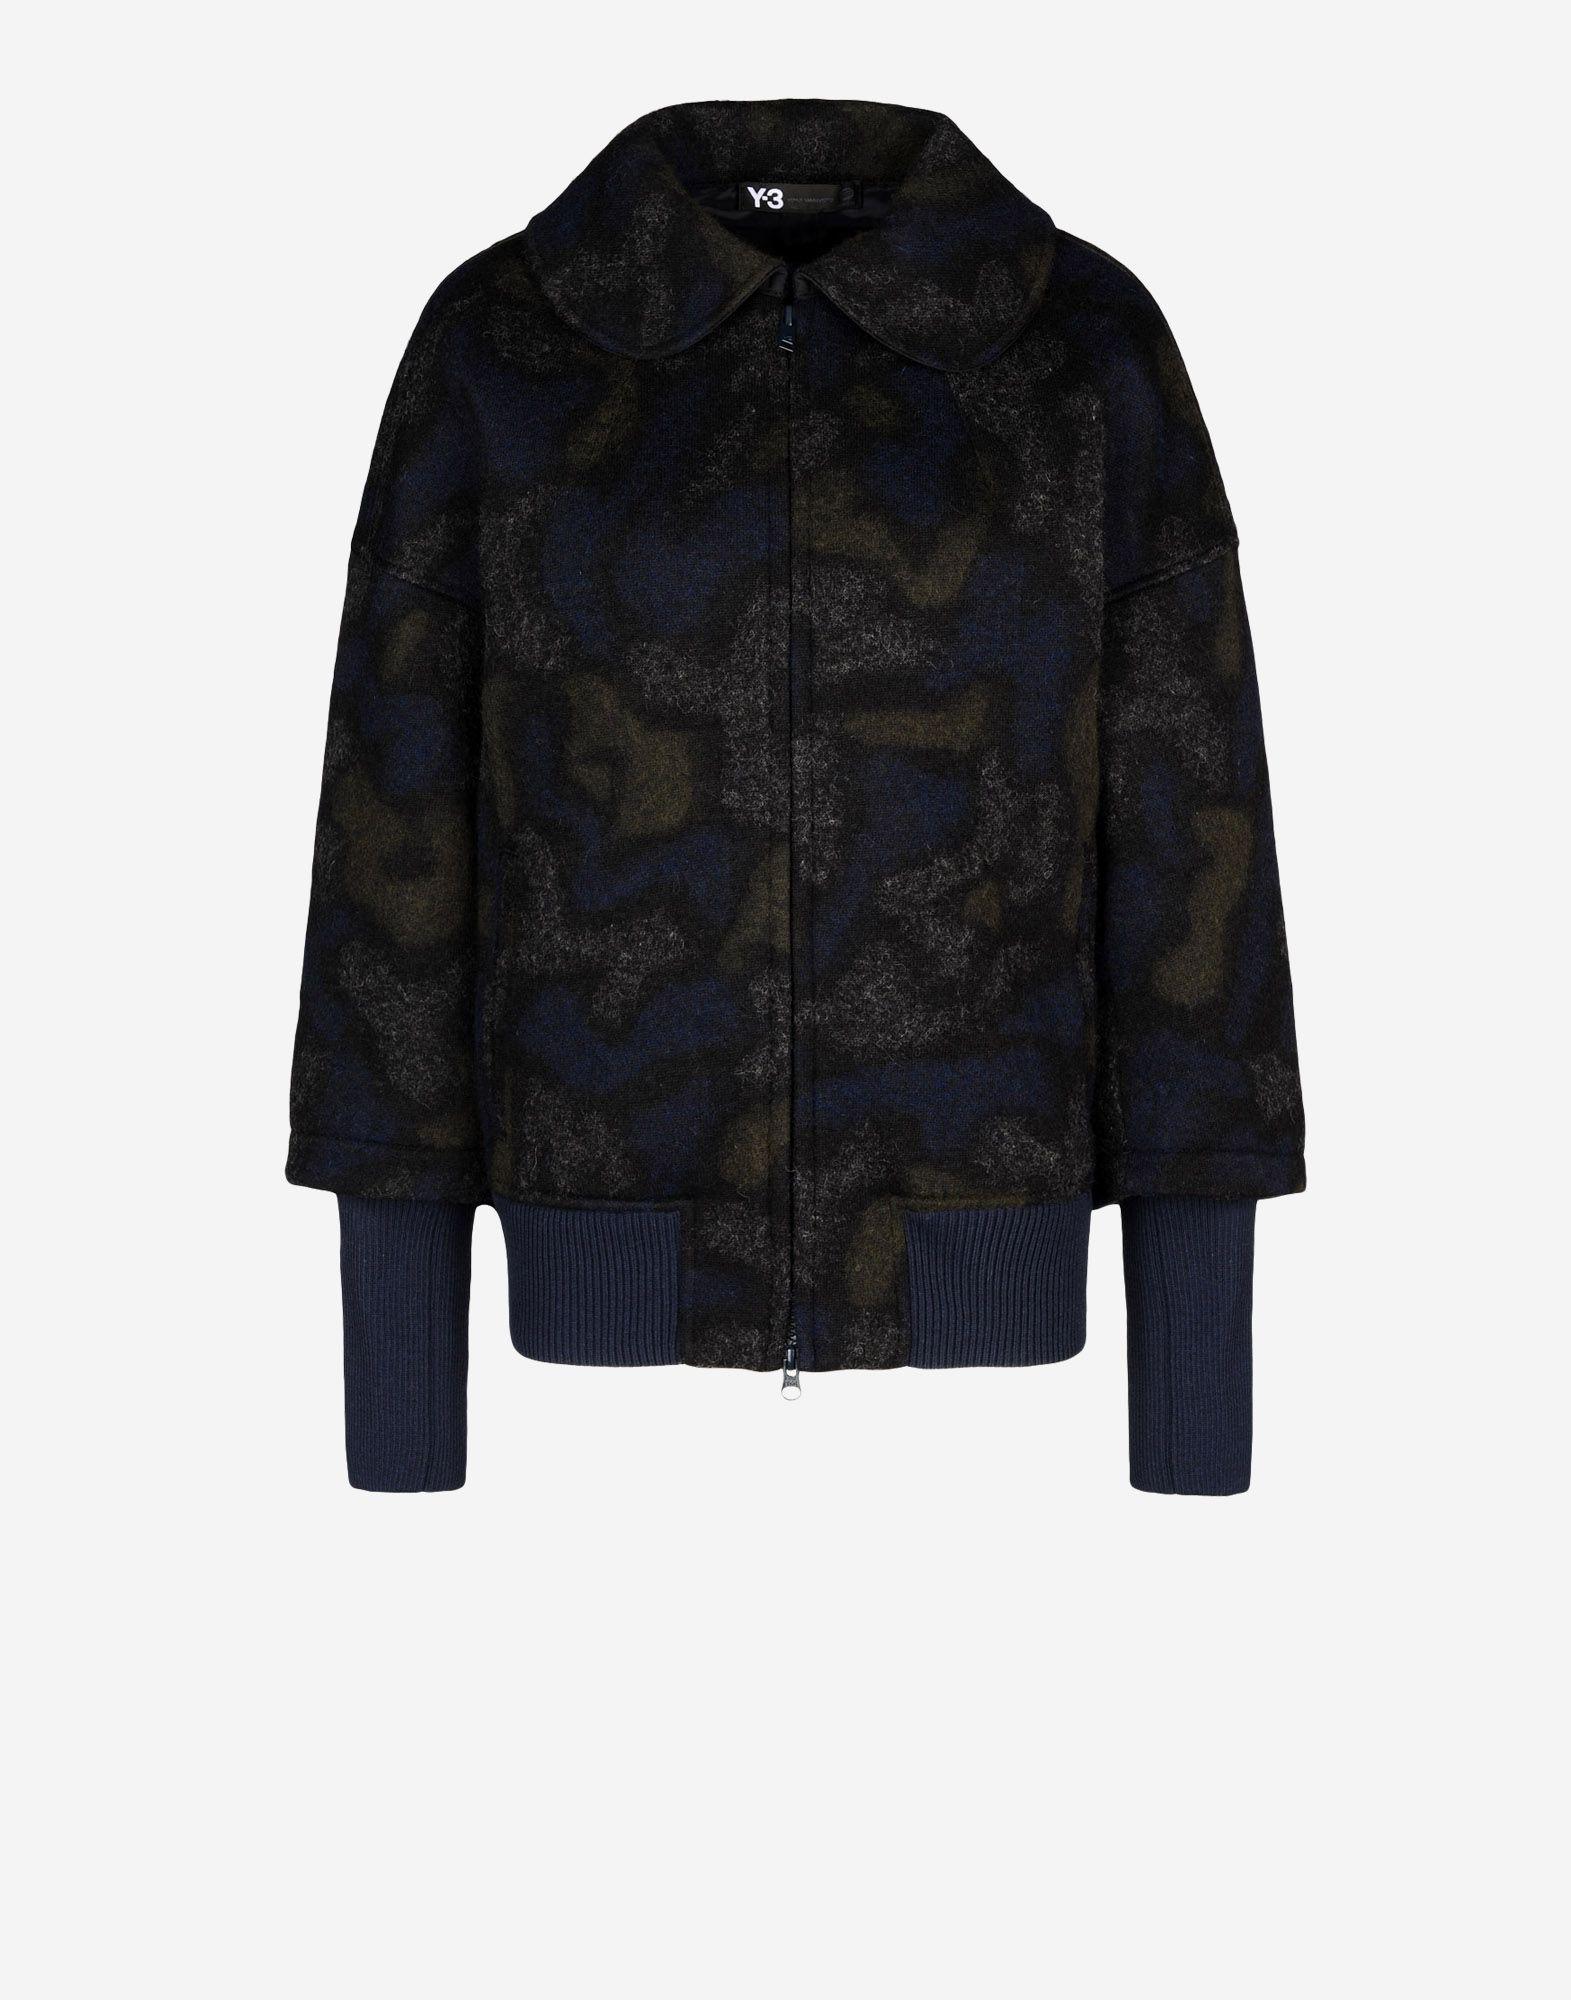 jackets y 3 bonded wool blouson for women online official store. Black Bedroom Furniture Sets. Home Design Ideas